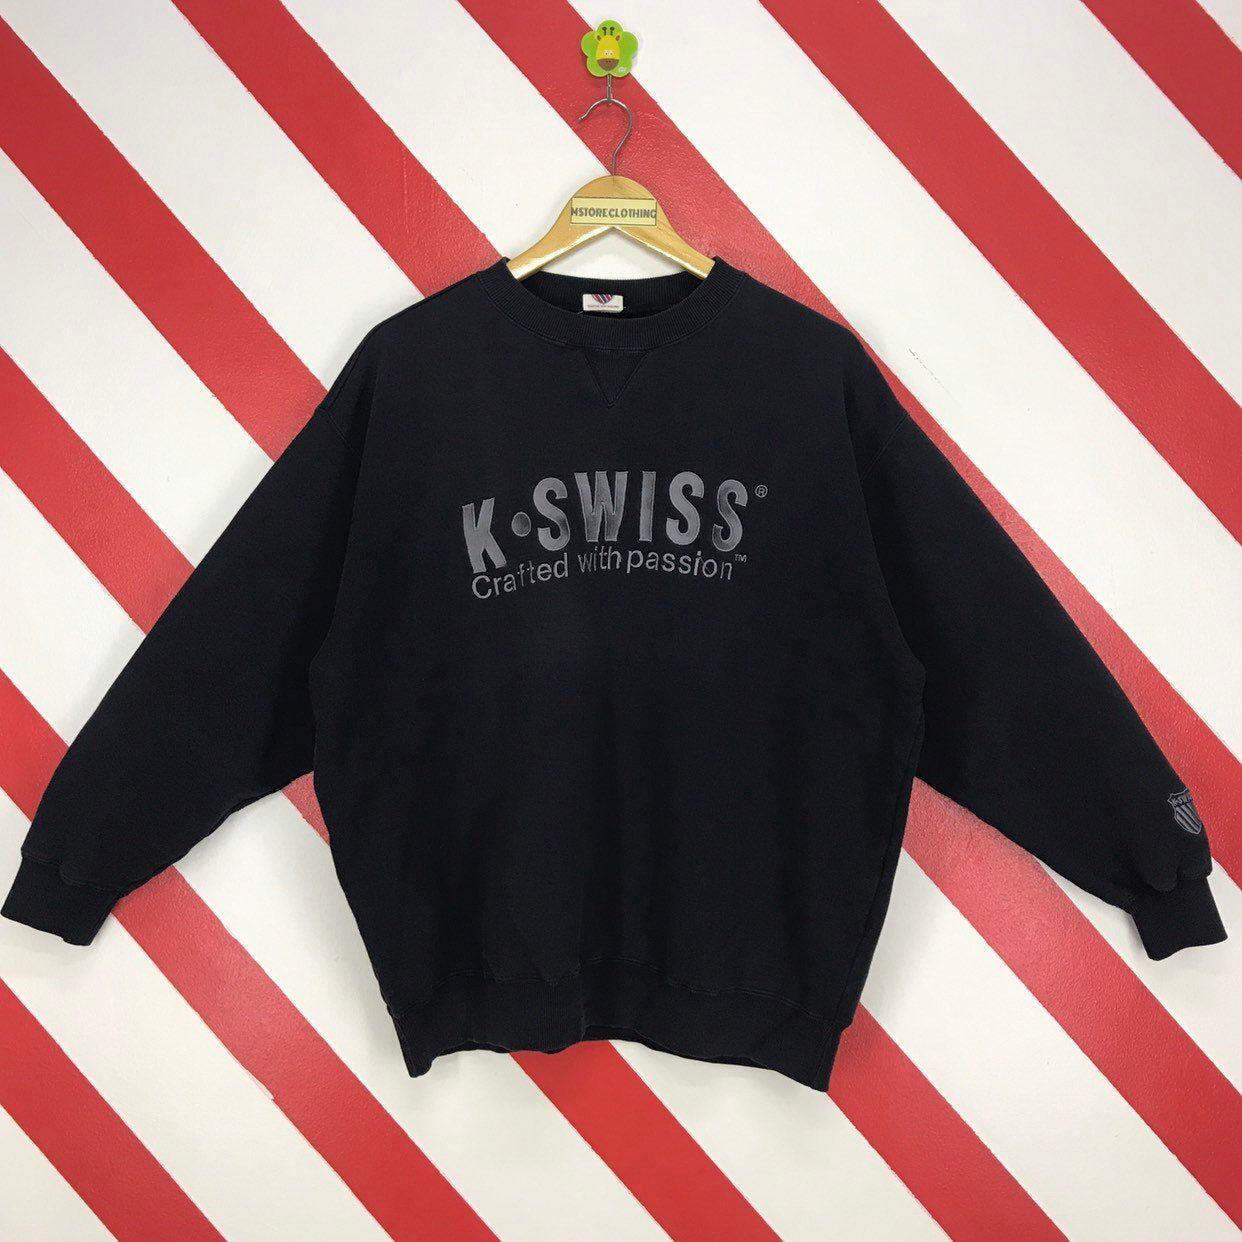 Vintage 90s K Swiss Sweatshirt Crewneck